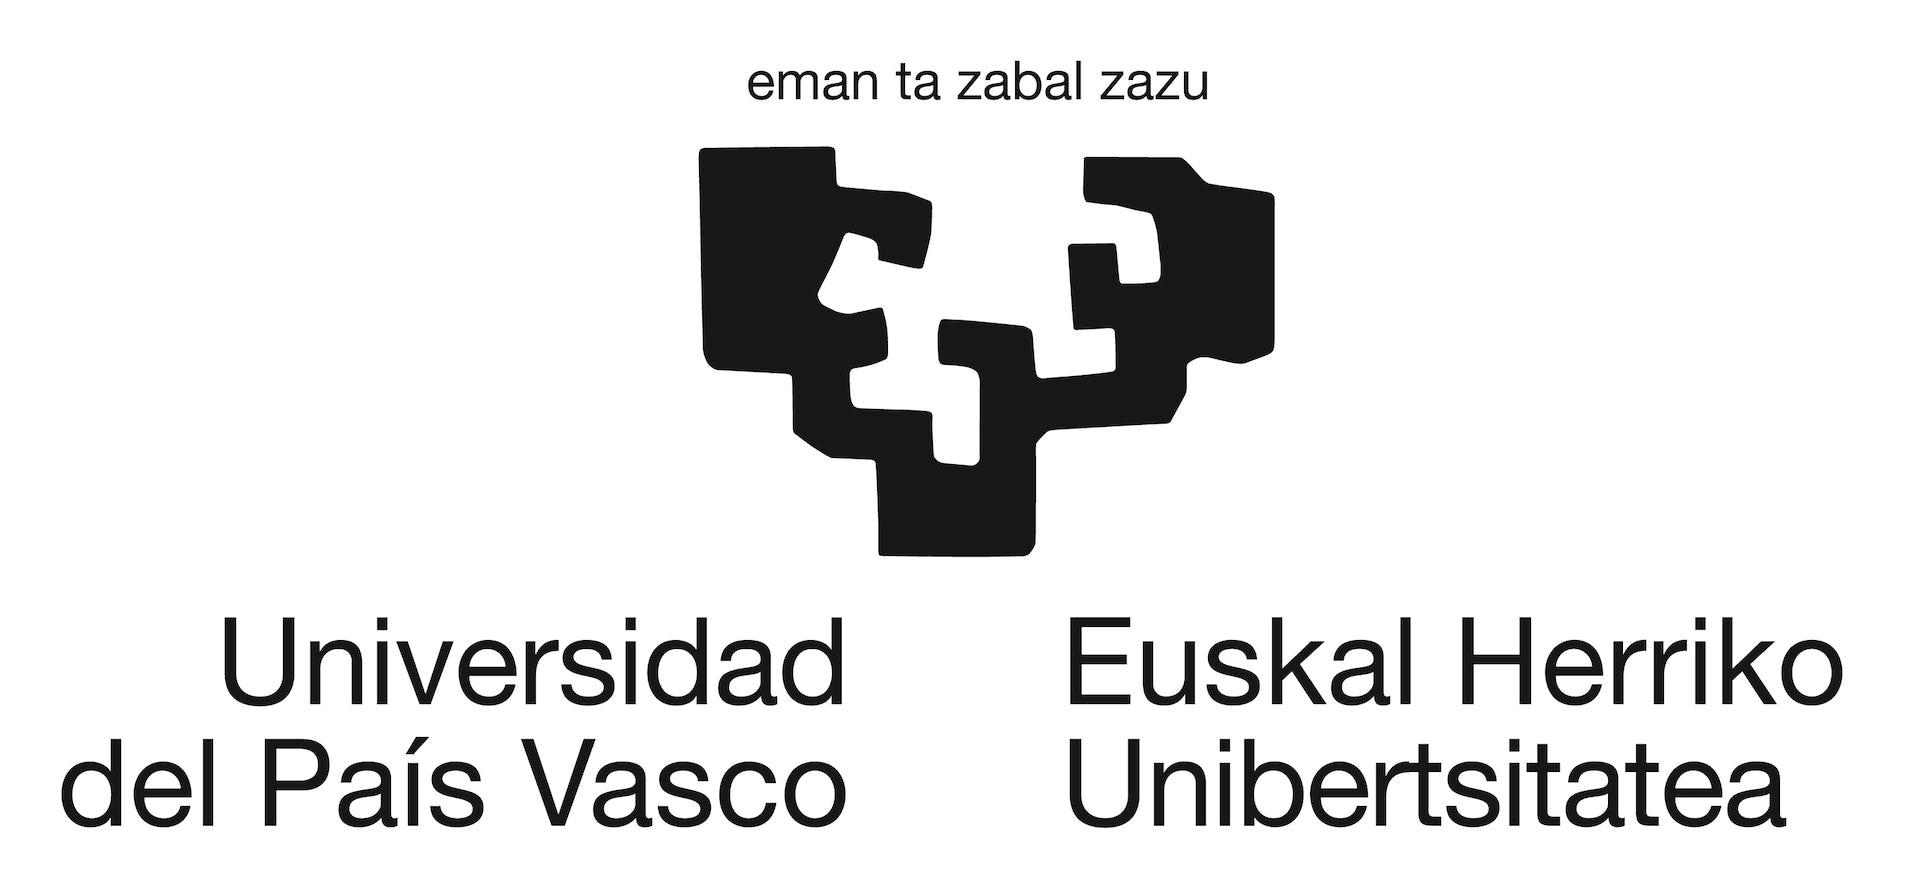 Universidad del País Vasco / Euskal Herriko Unibertsitatea